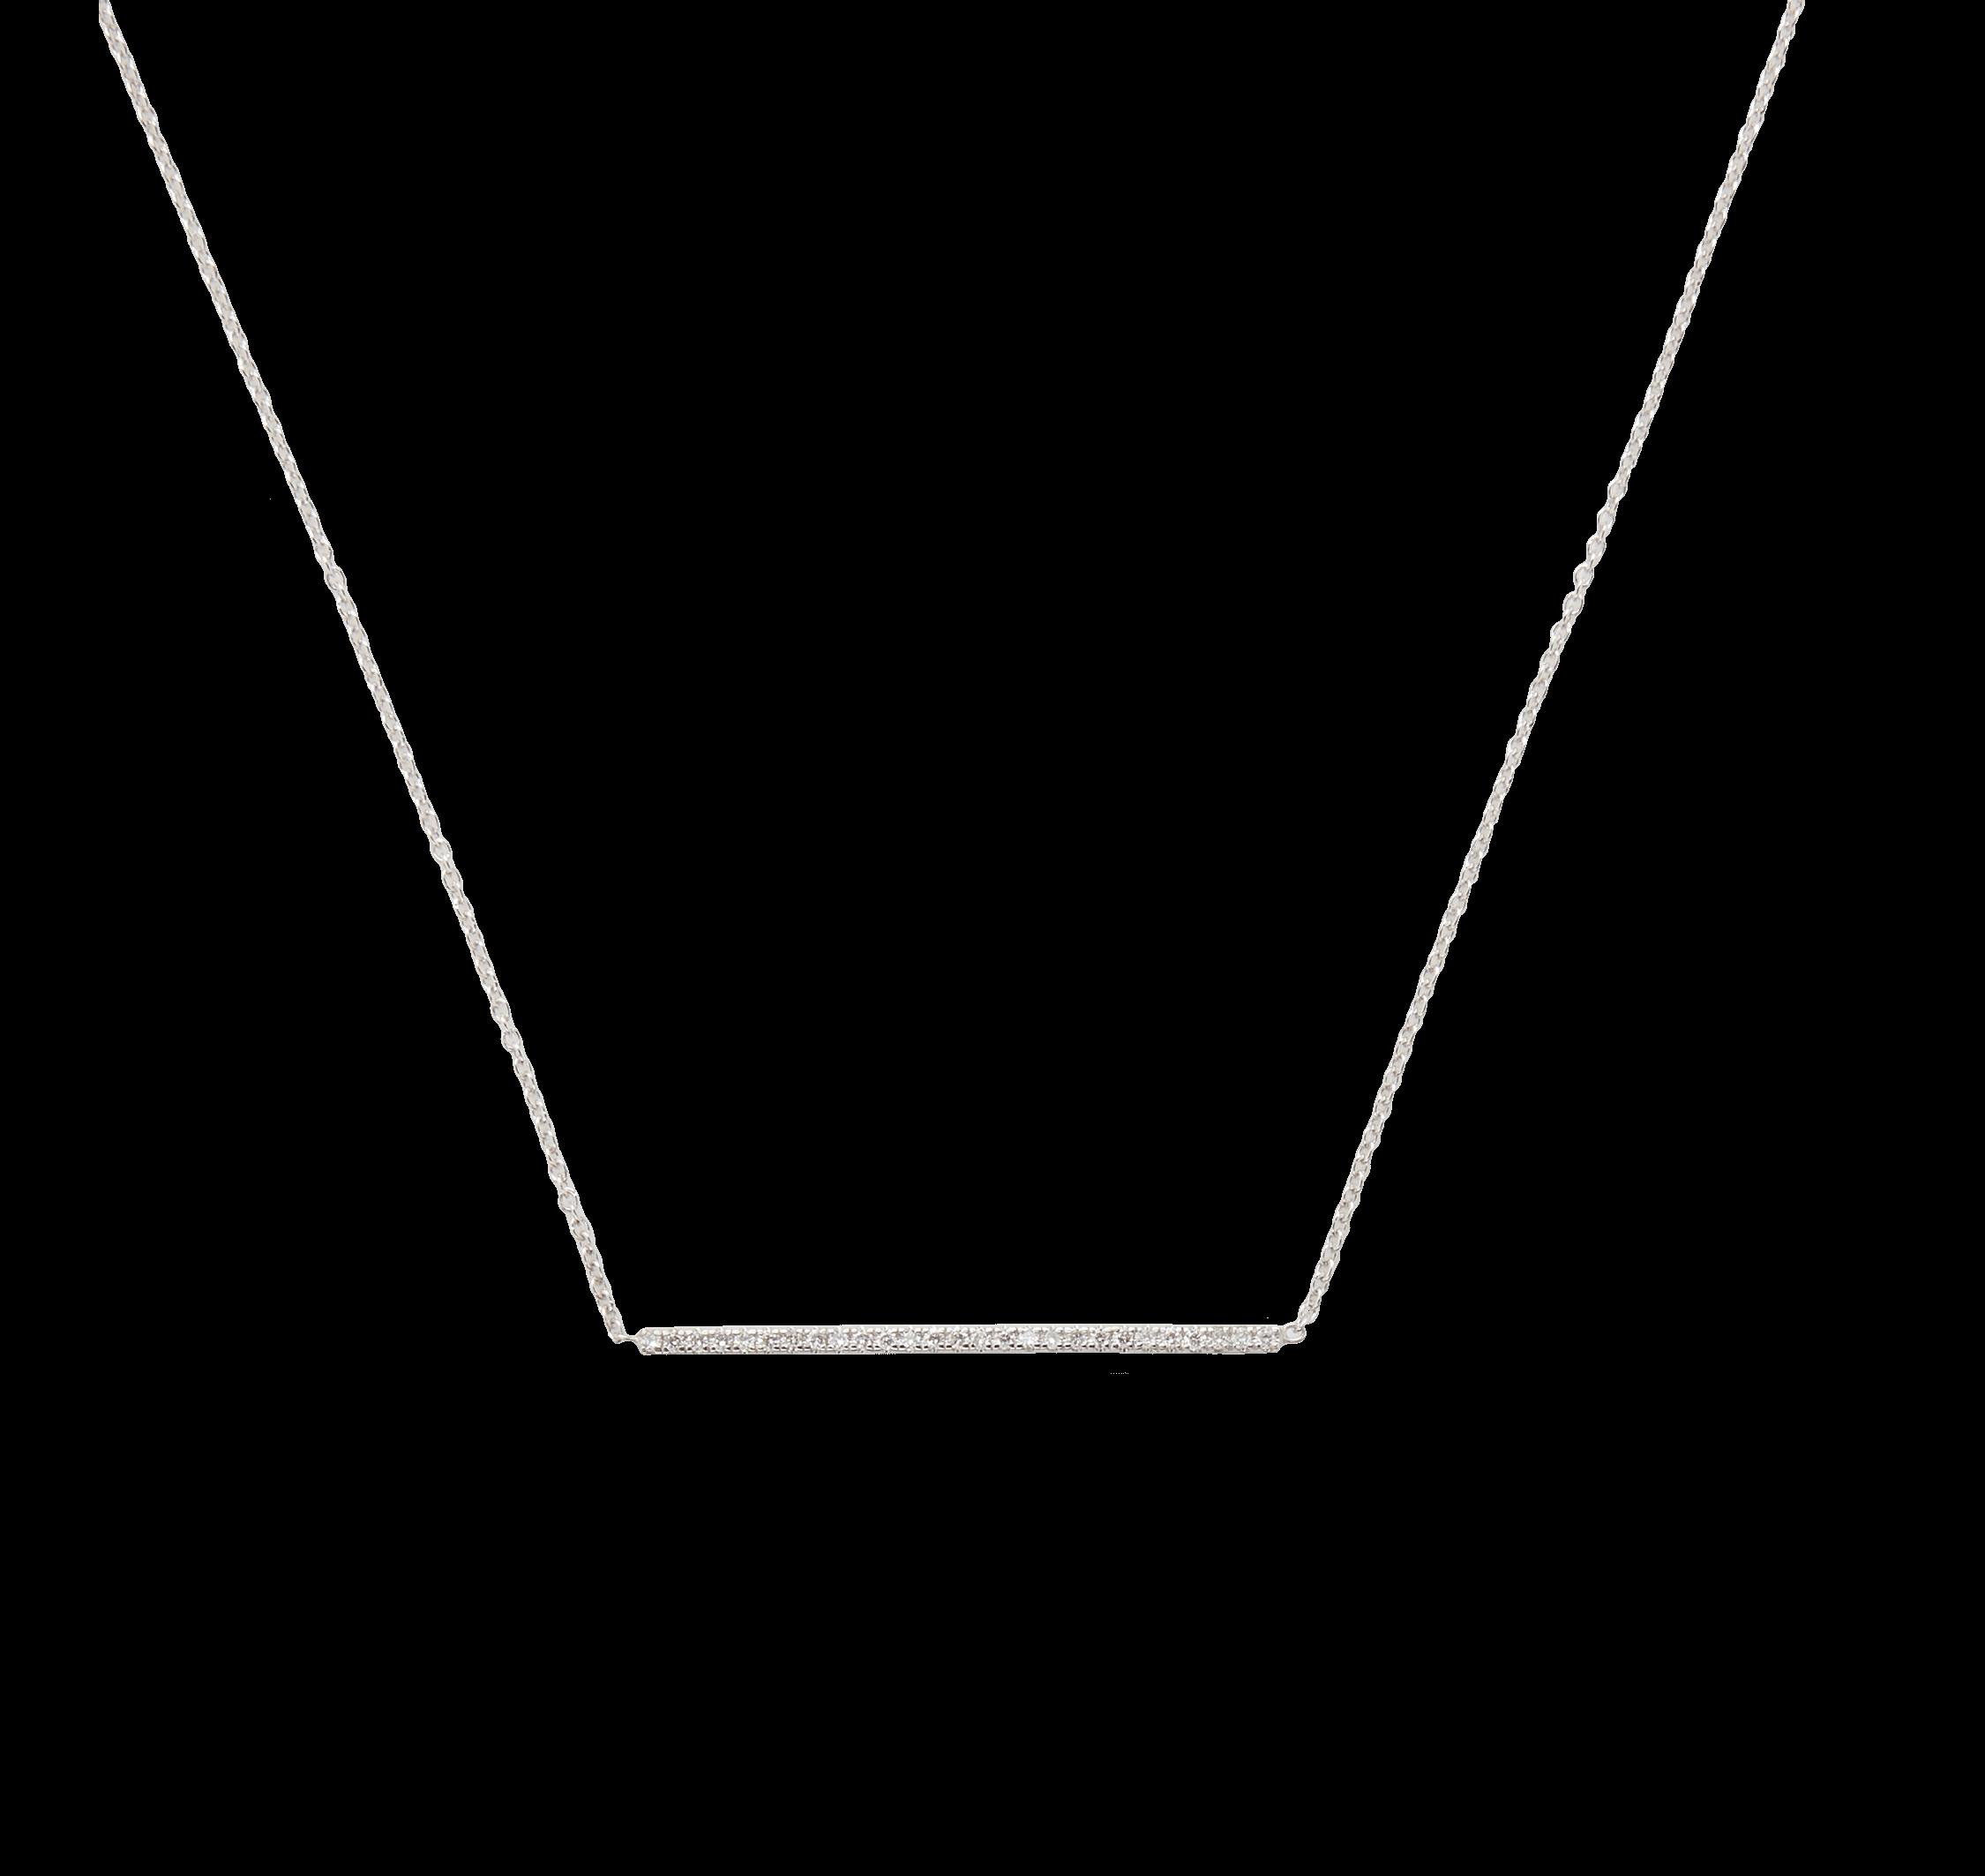 18K Dia Bar Necklace